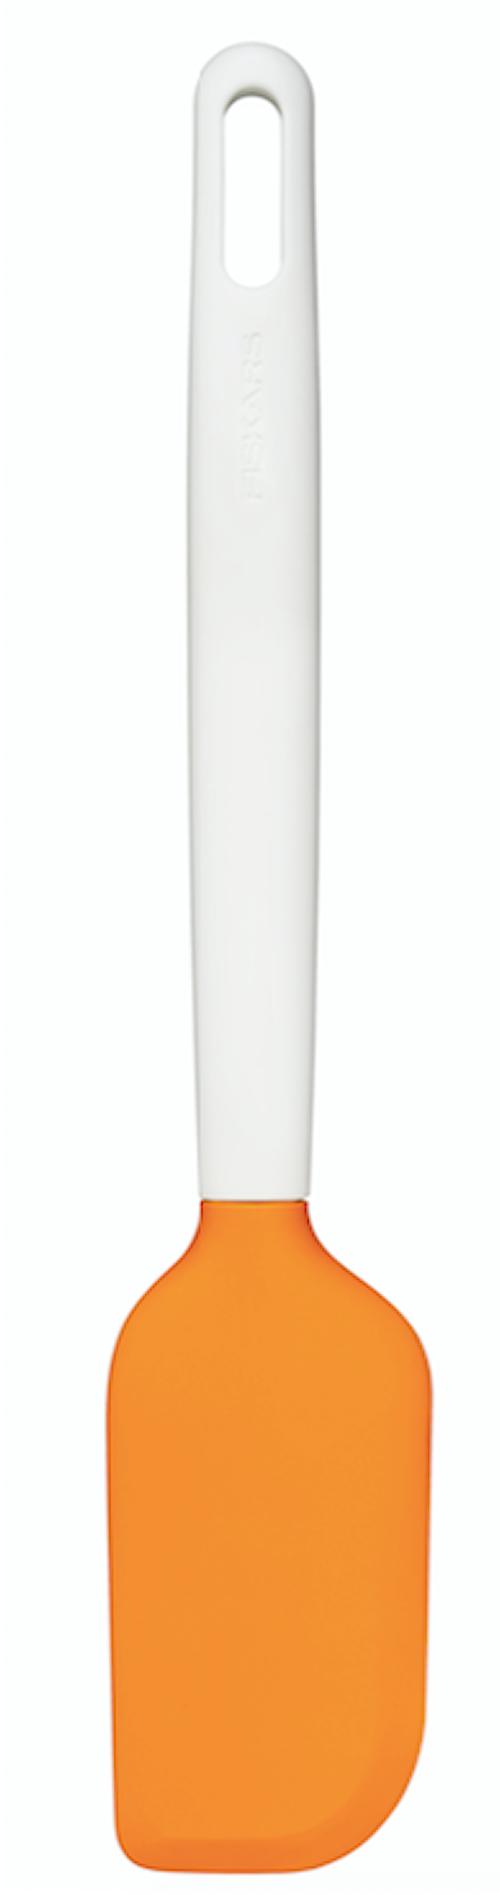 FF Dejskraber 26,5 cm